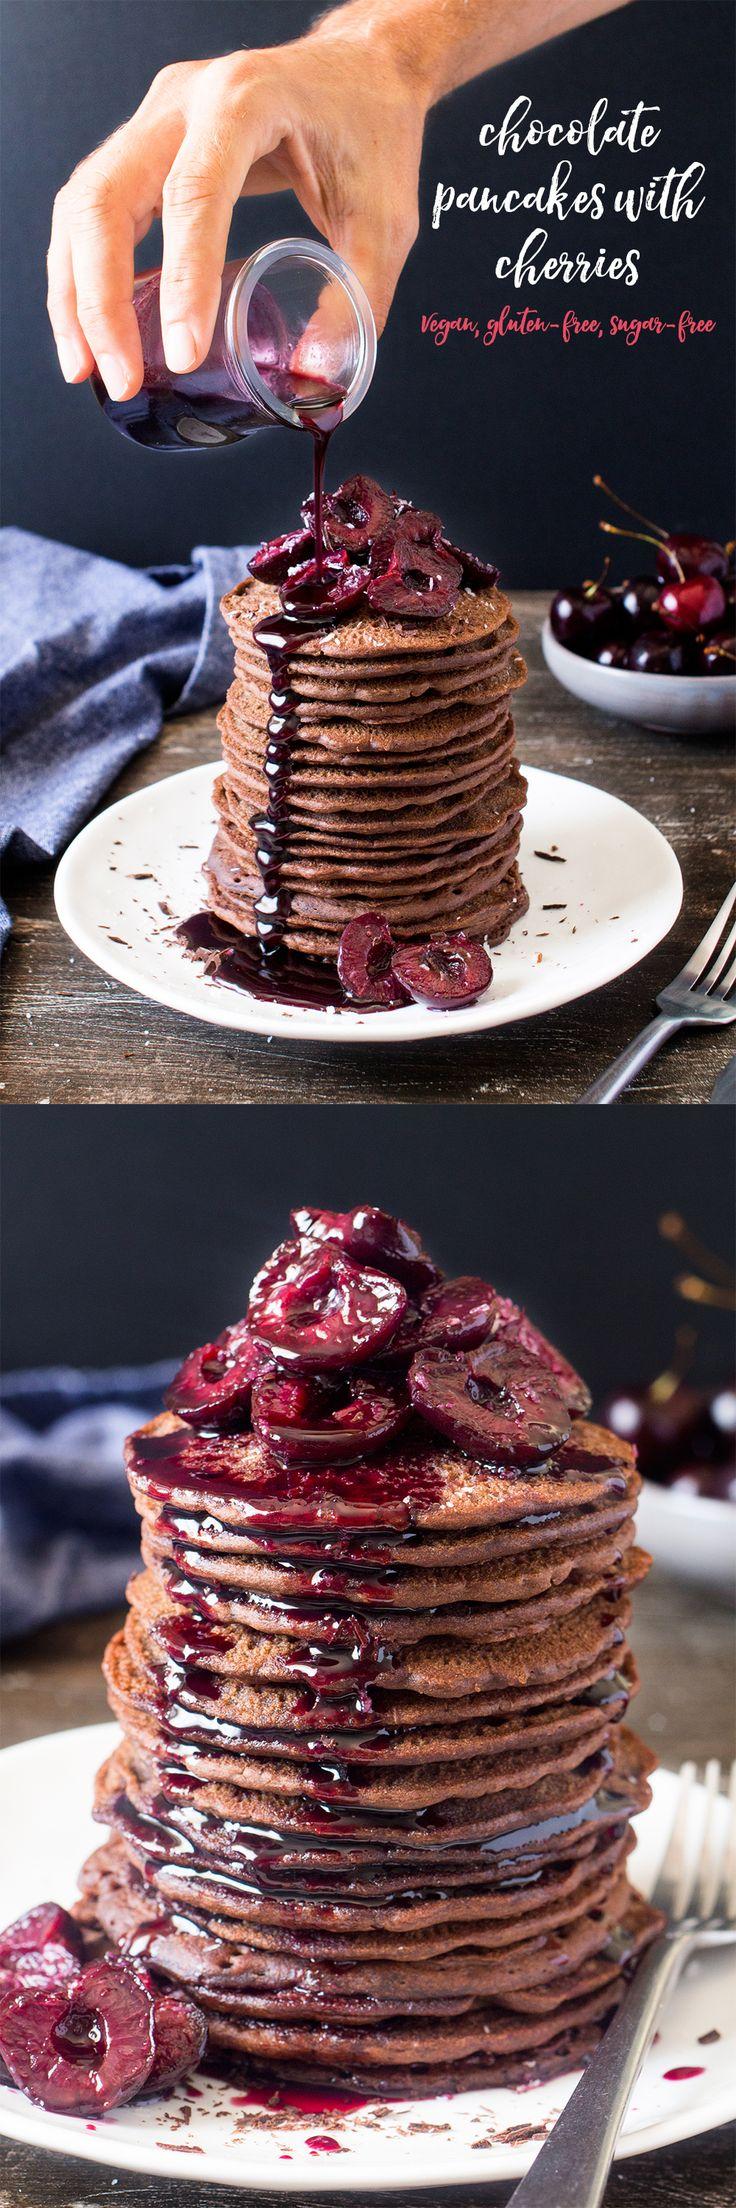 Vegan chocolate pancakes with cherries (Gluten Free Recipes Pancakes)